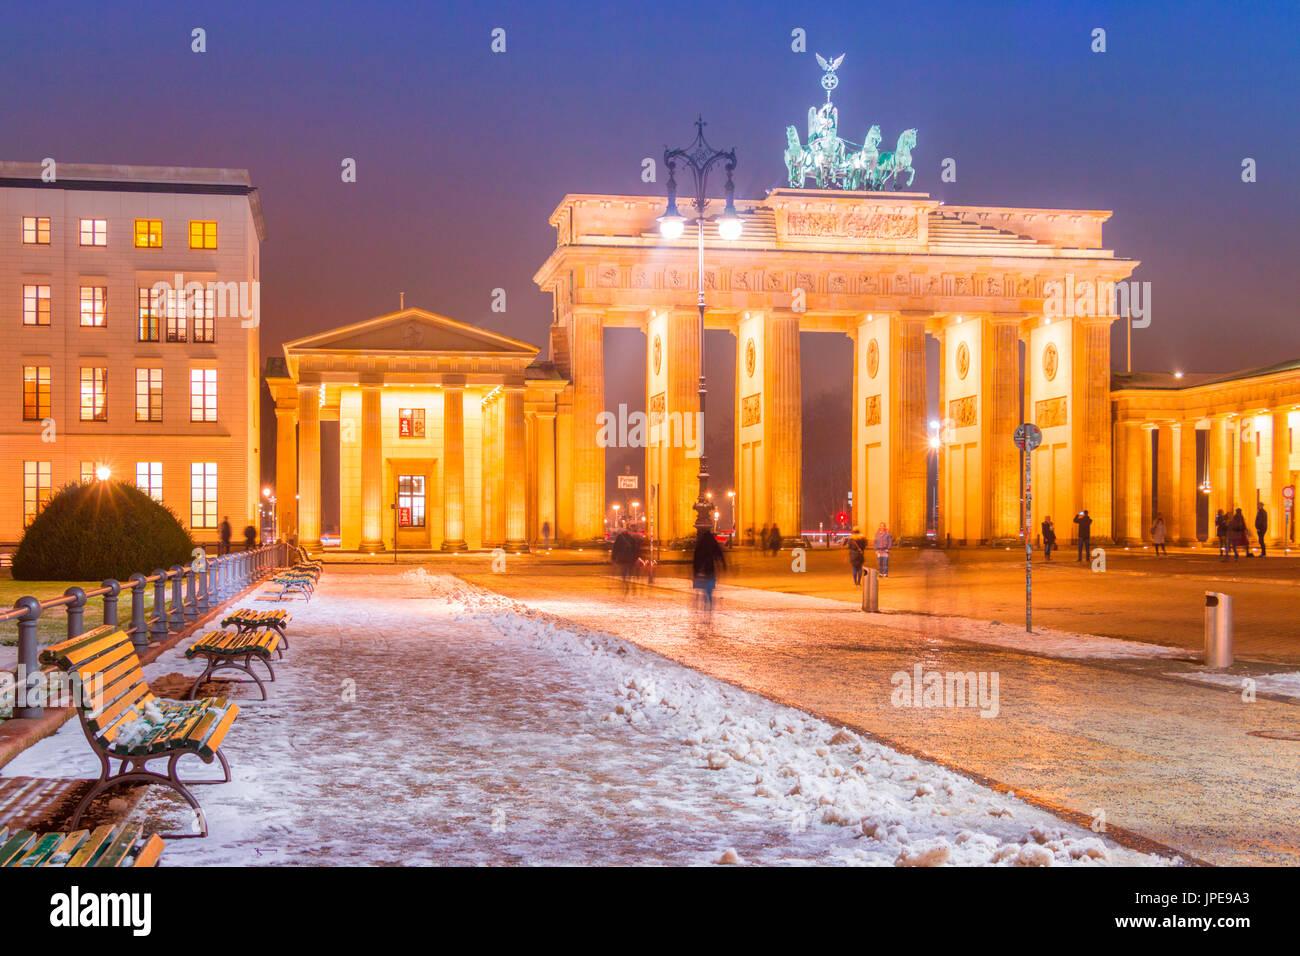 Pariser Platz and Brandenburg Gate in Berlin city with snow, Land Berlin, Germany, Europe - Stock Image